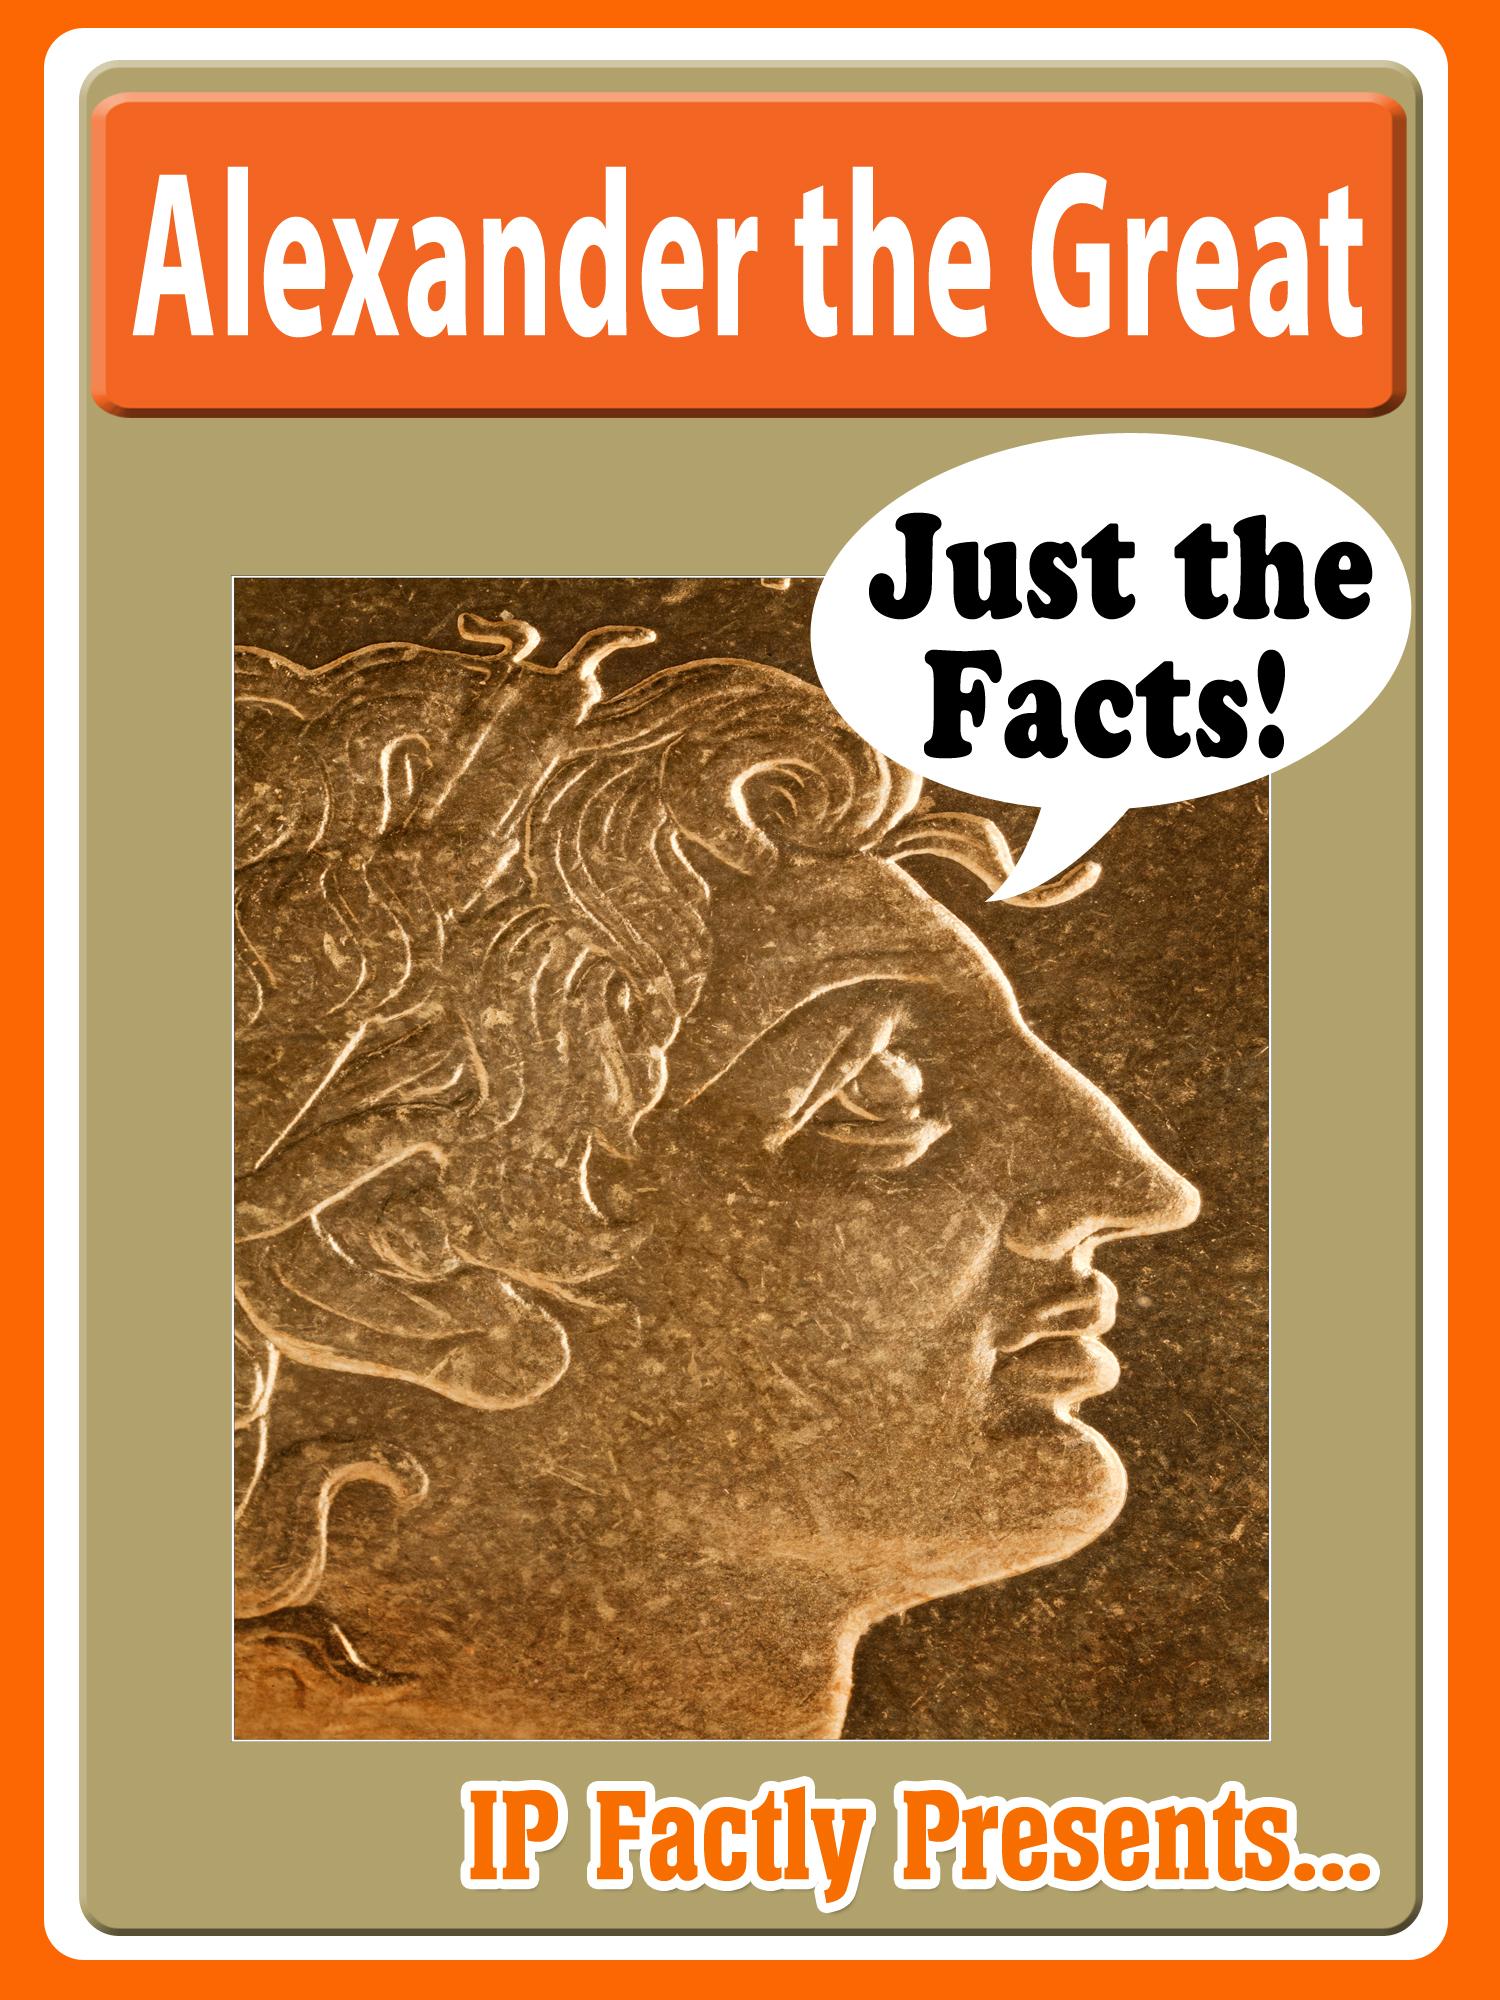 alexander the great accomplishments essay